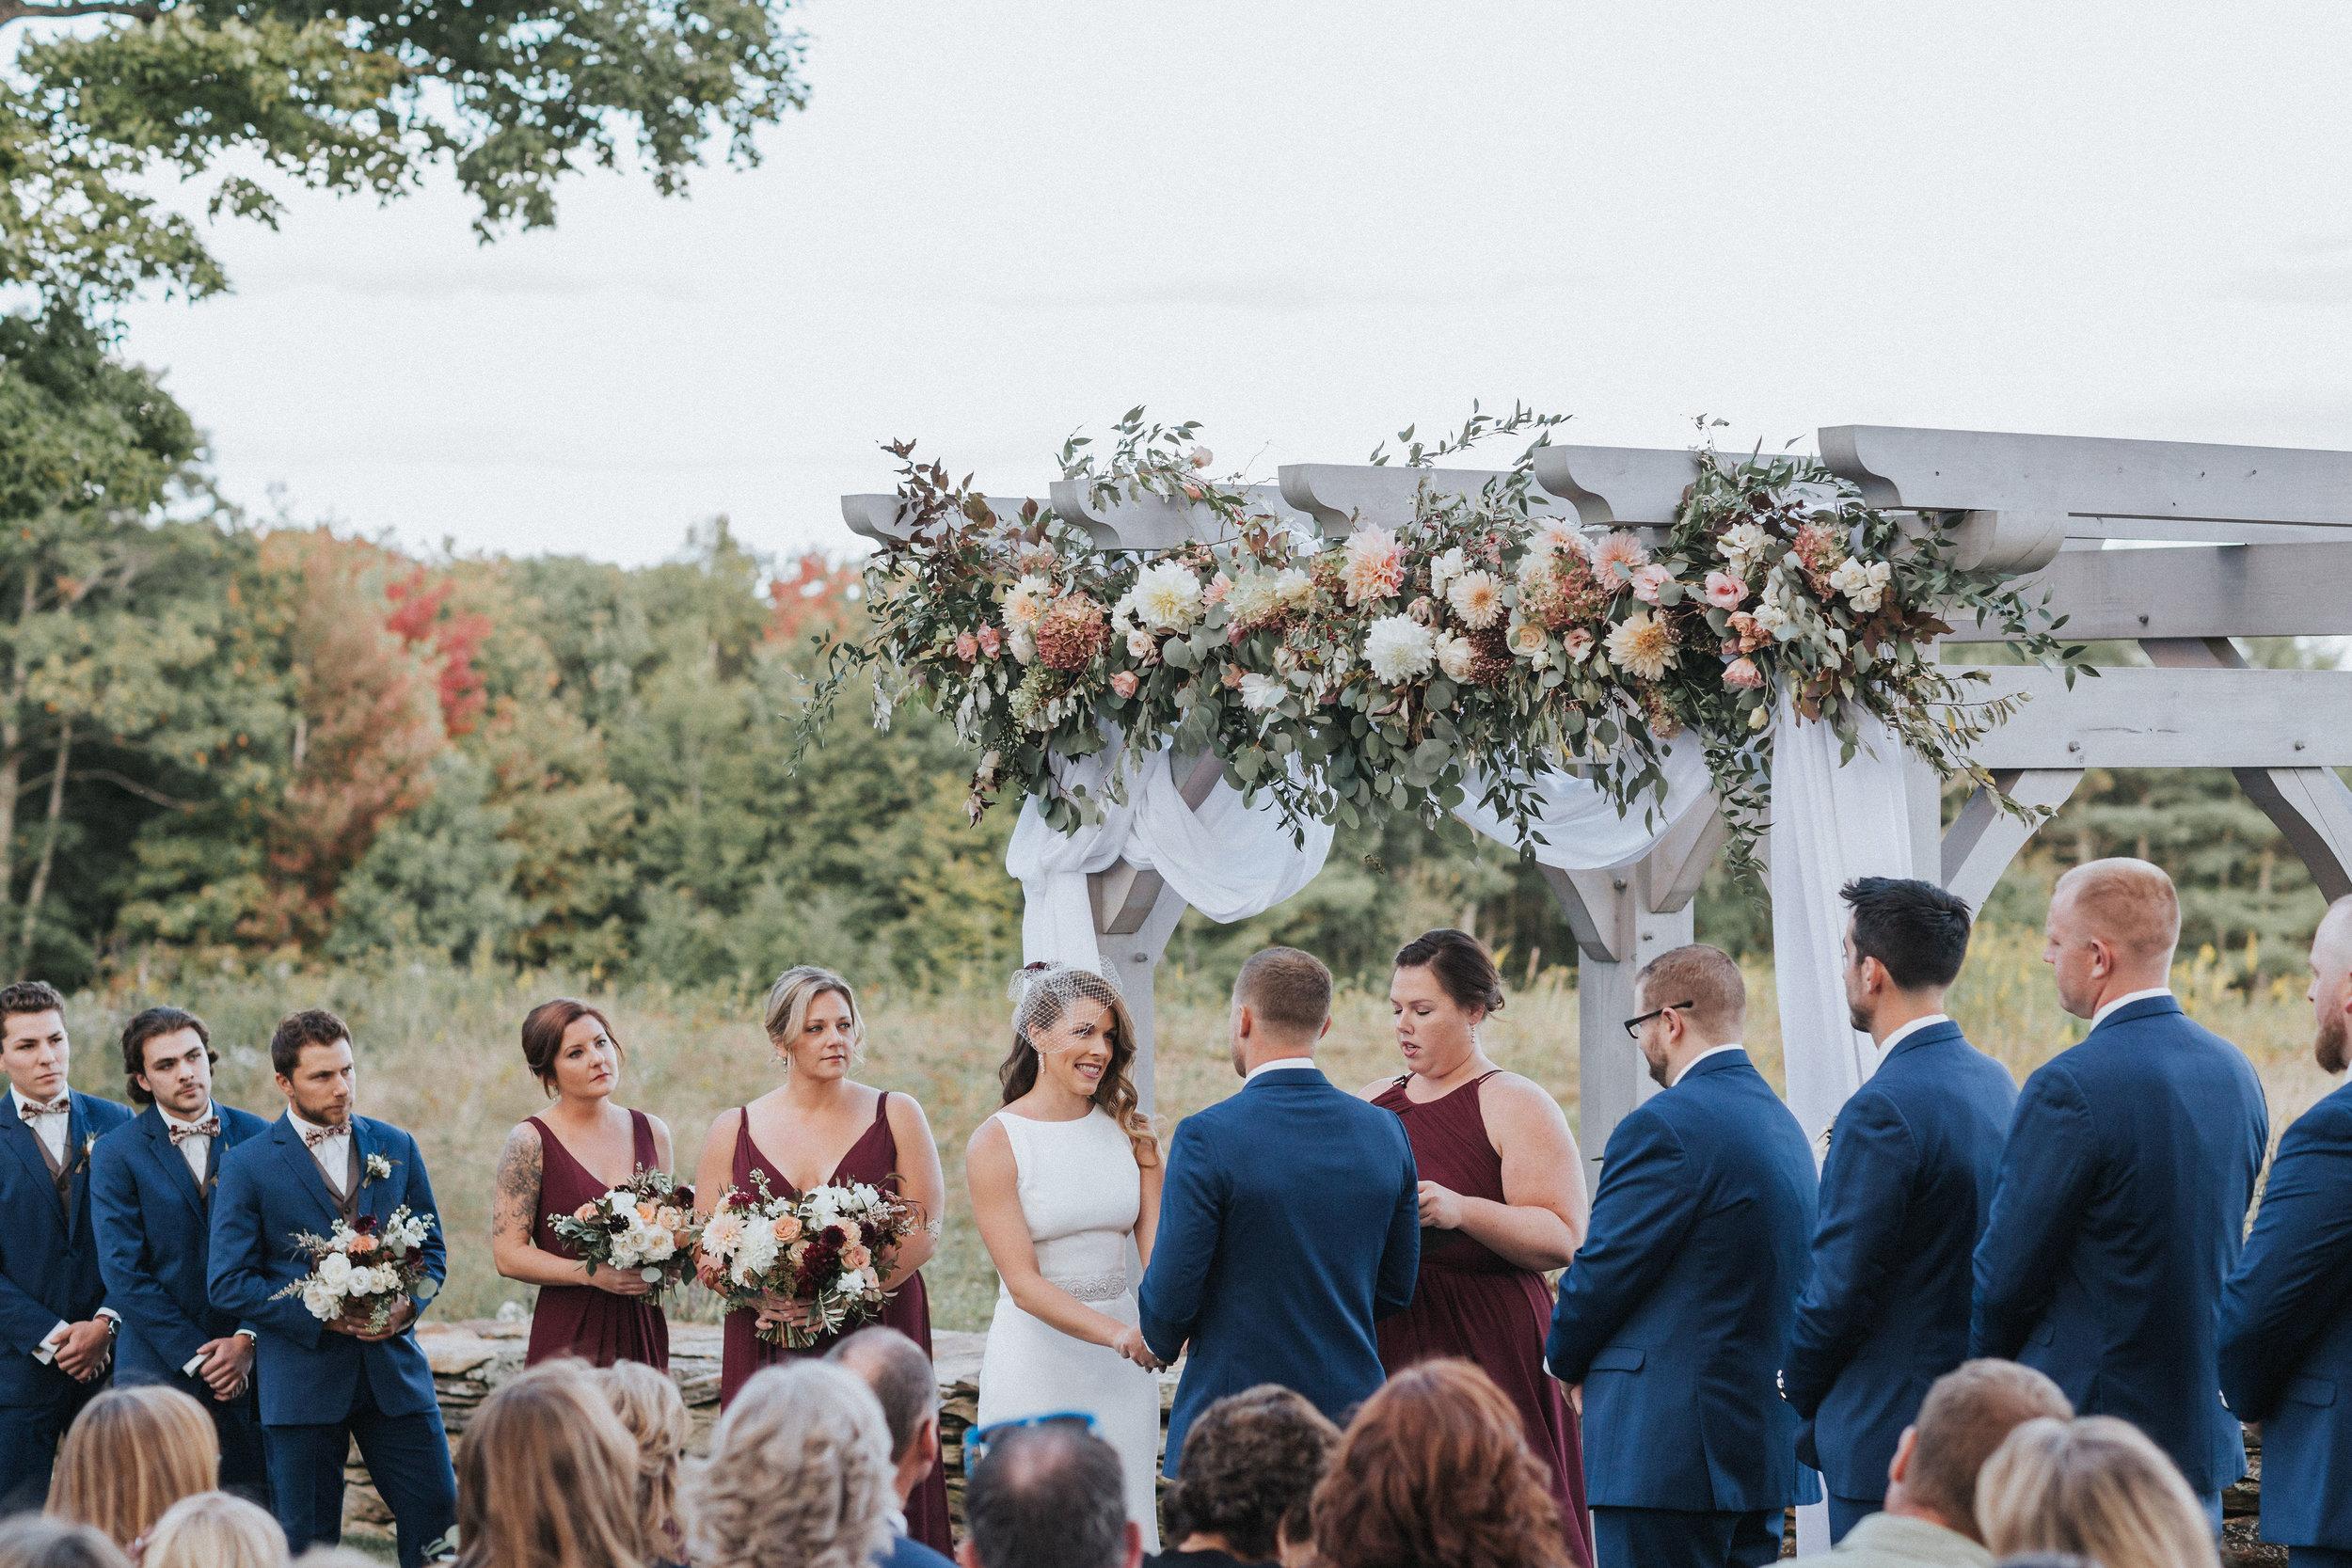 Allie_Greg_Beech_Hill_Barn_Wedding_Ceremony-132.jpg